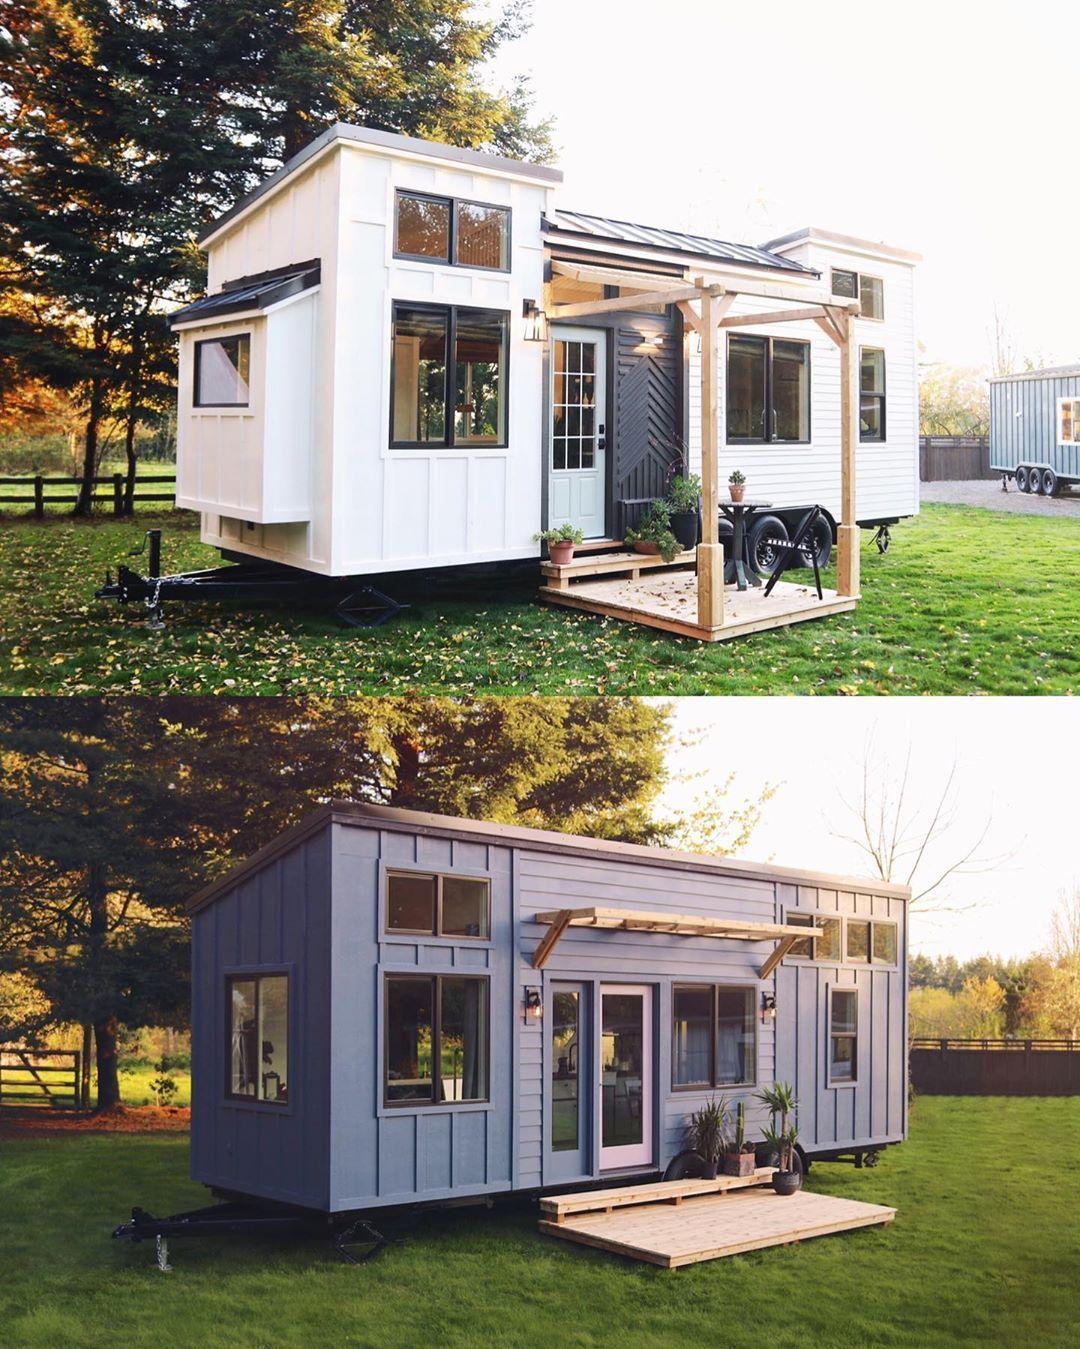 Smallhouse Exterior Ideas: #tinyhousemovement #tinyhouses